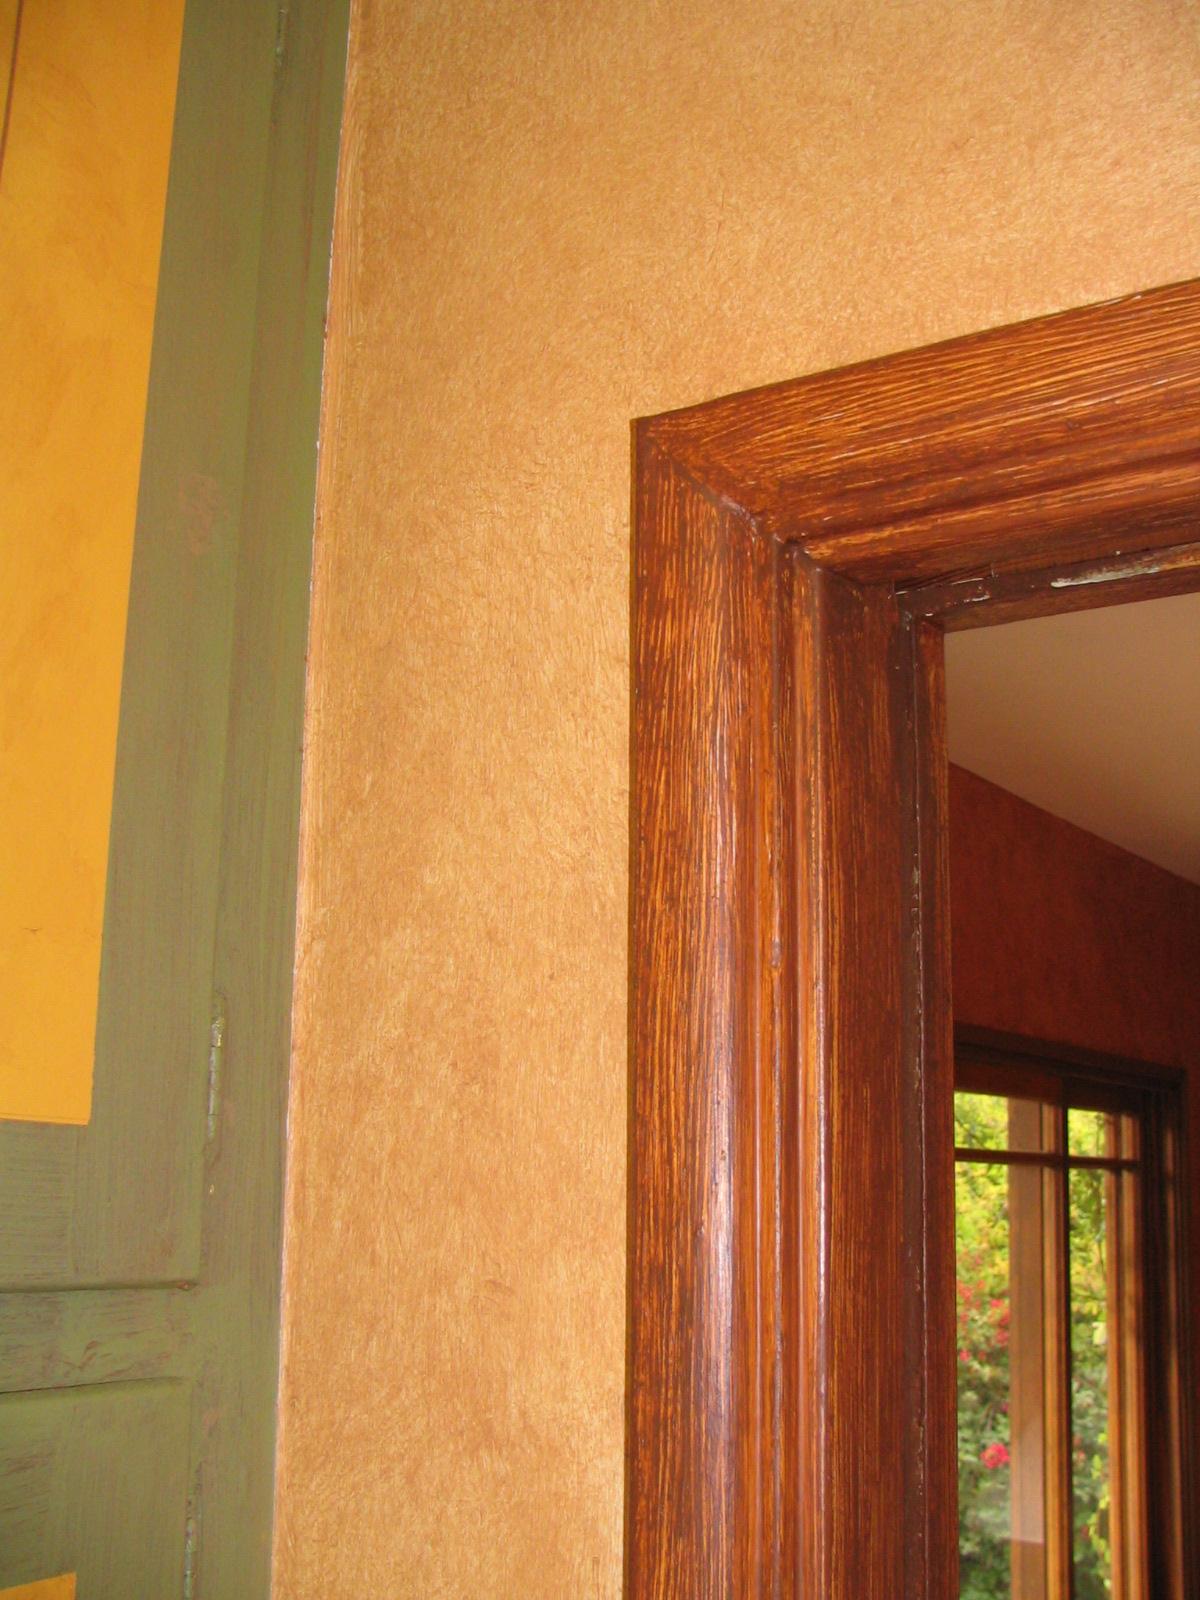 Faux Walls & Woodgrained Doorframe